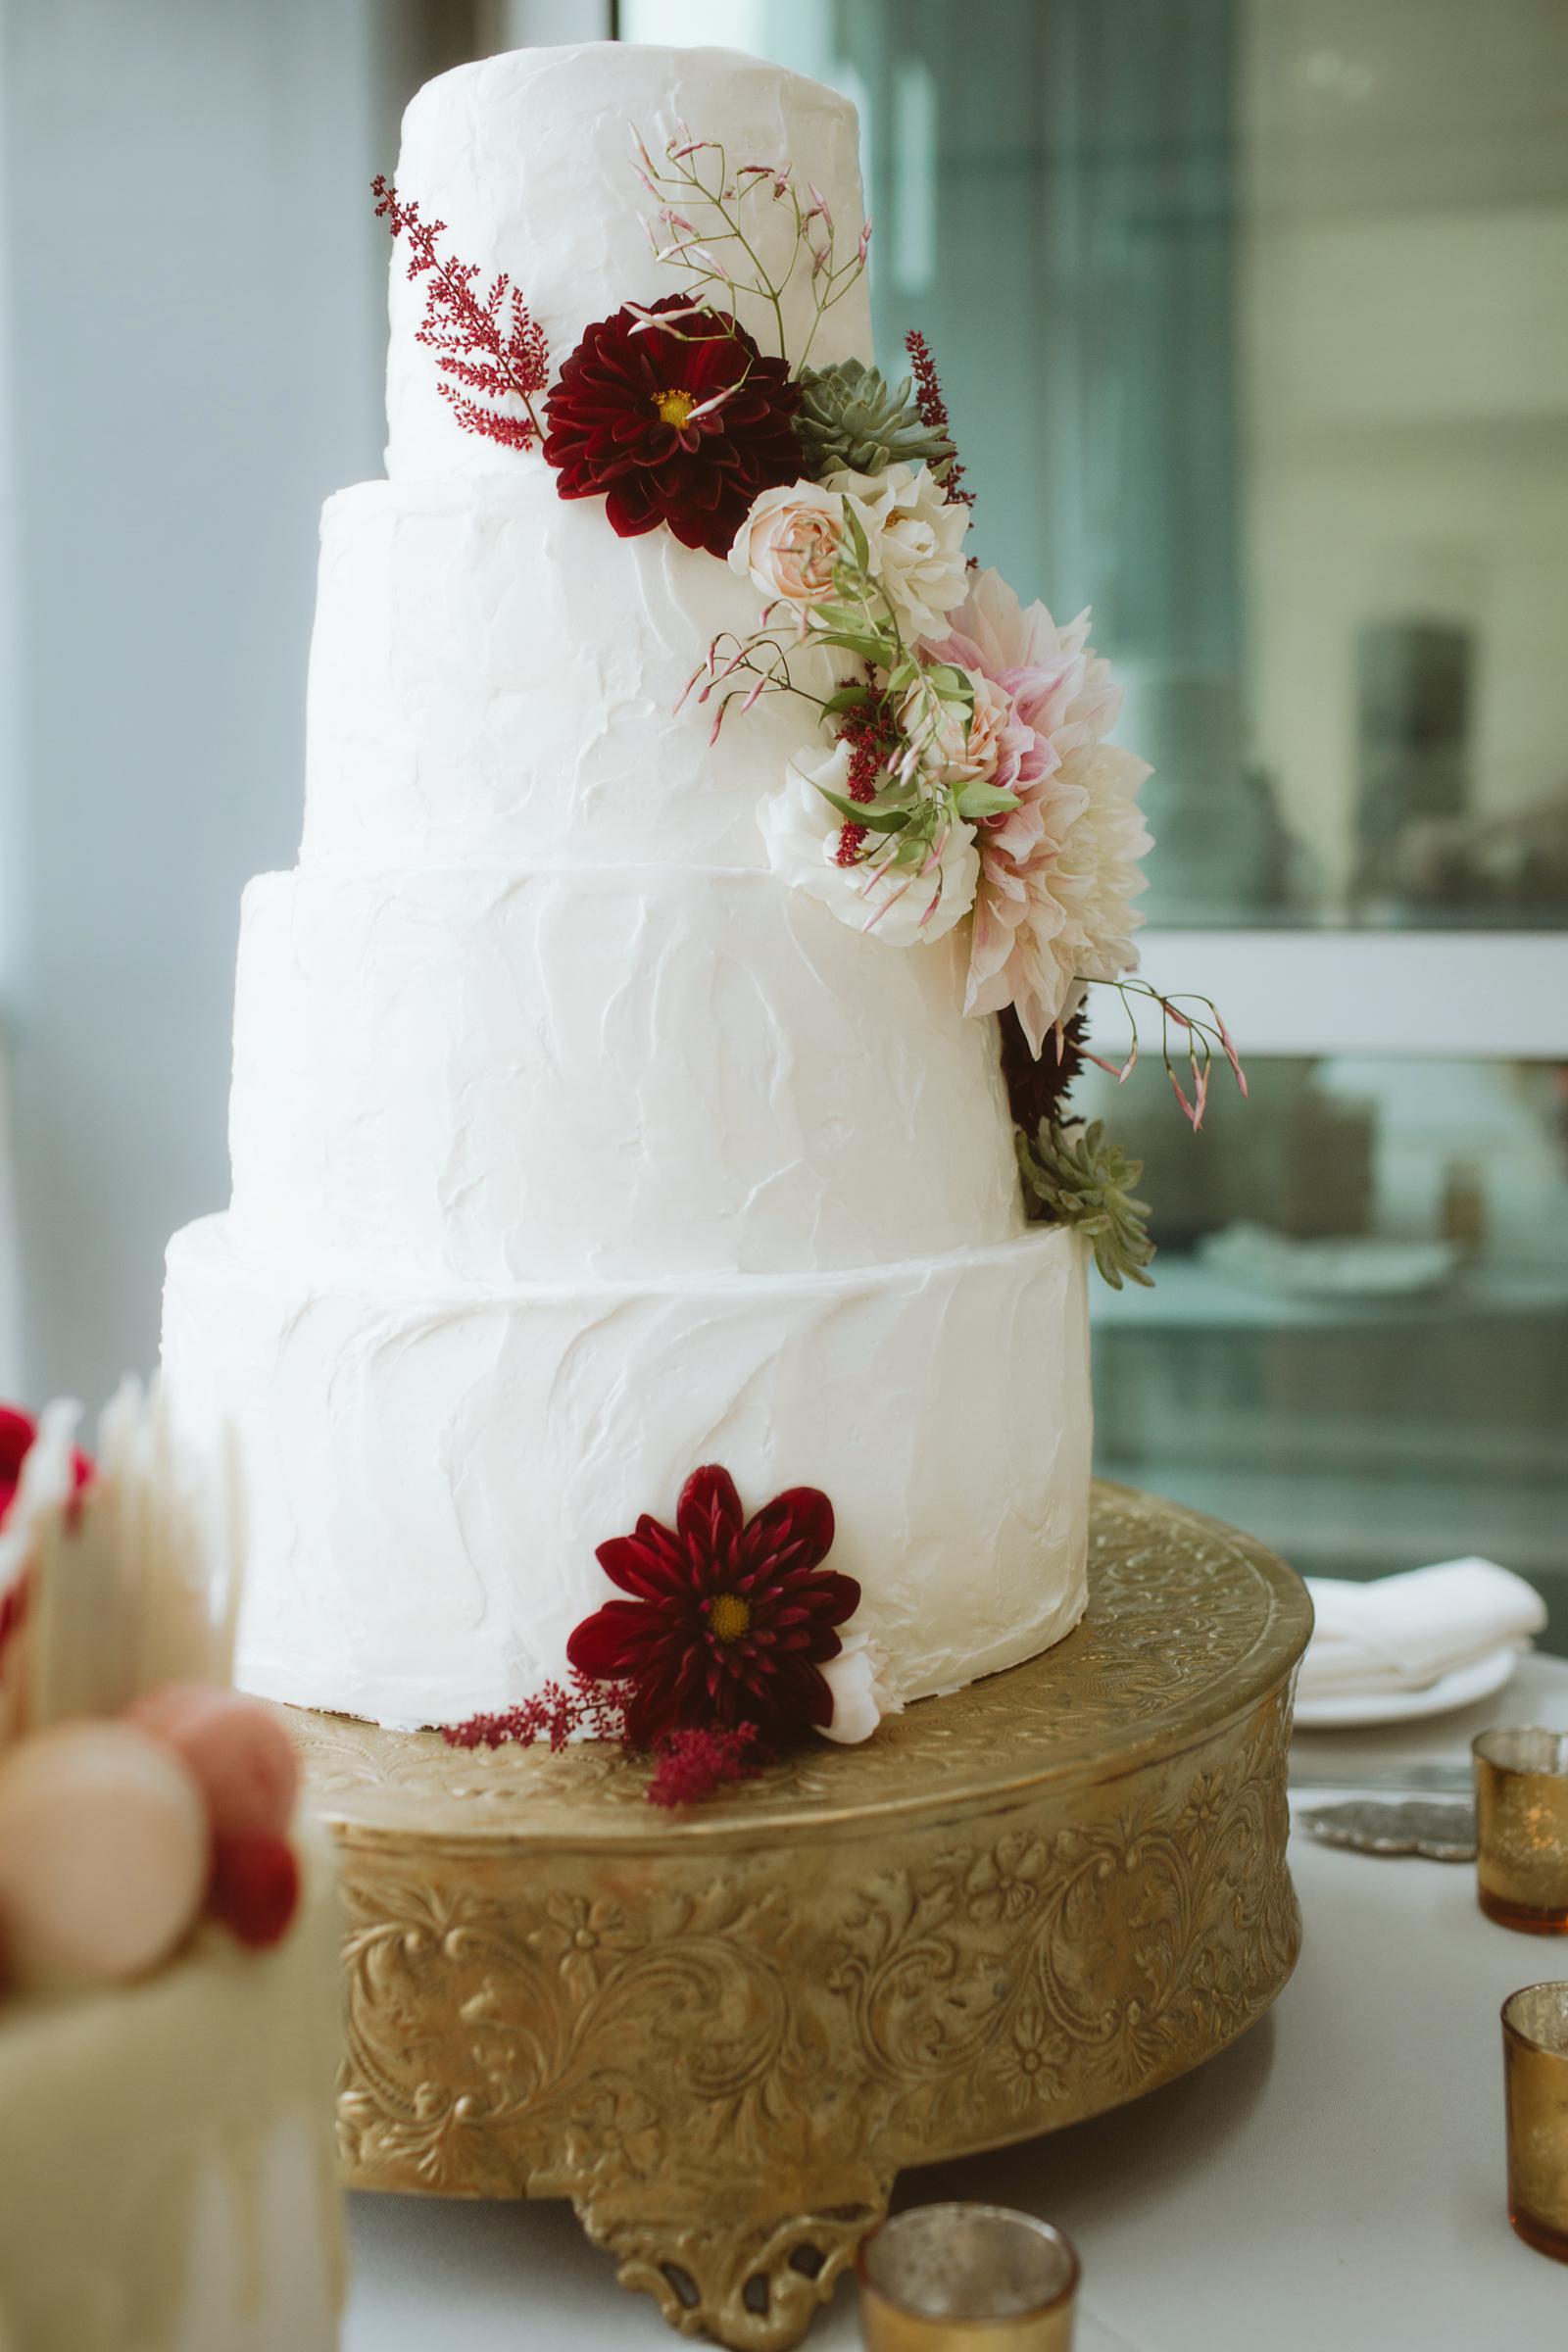 wedding day | MFA St Pete | Vanessa Boy Photography | vanessaboy.com-222.com |final.jpg